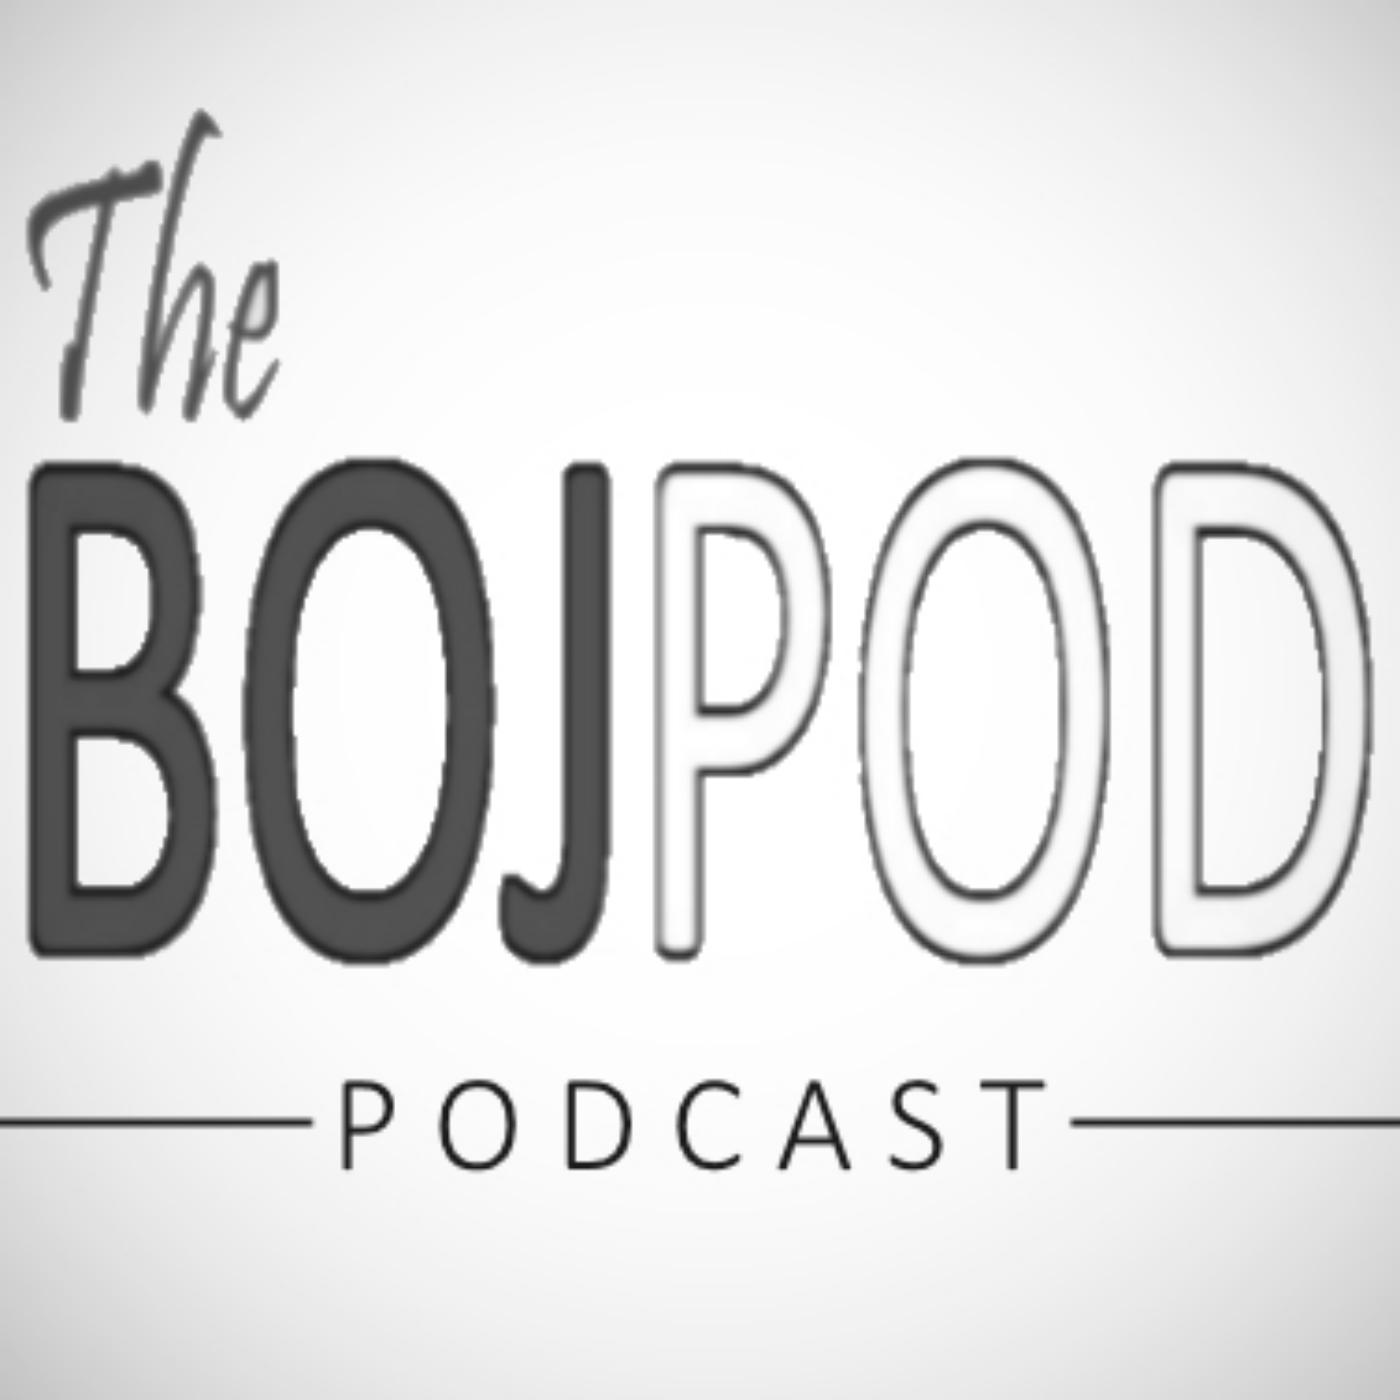 The BOJPOD